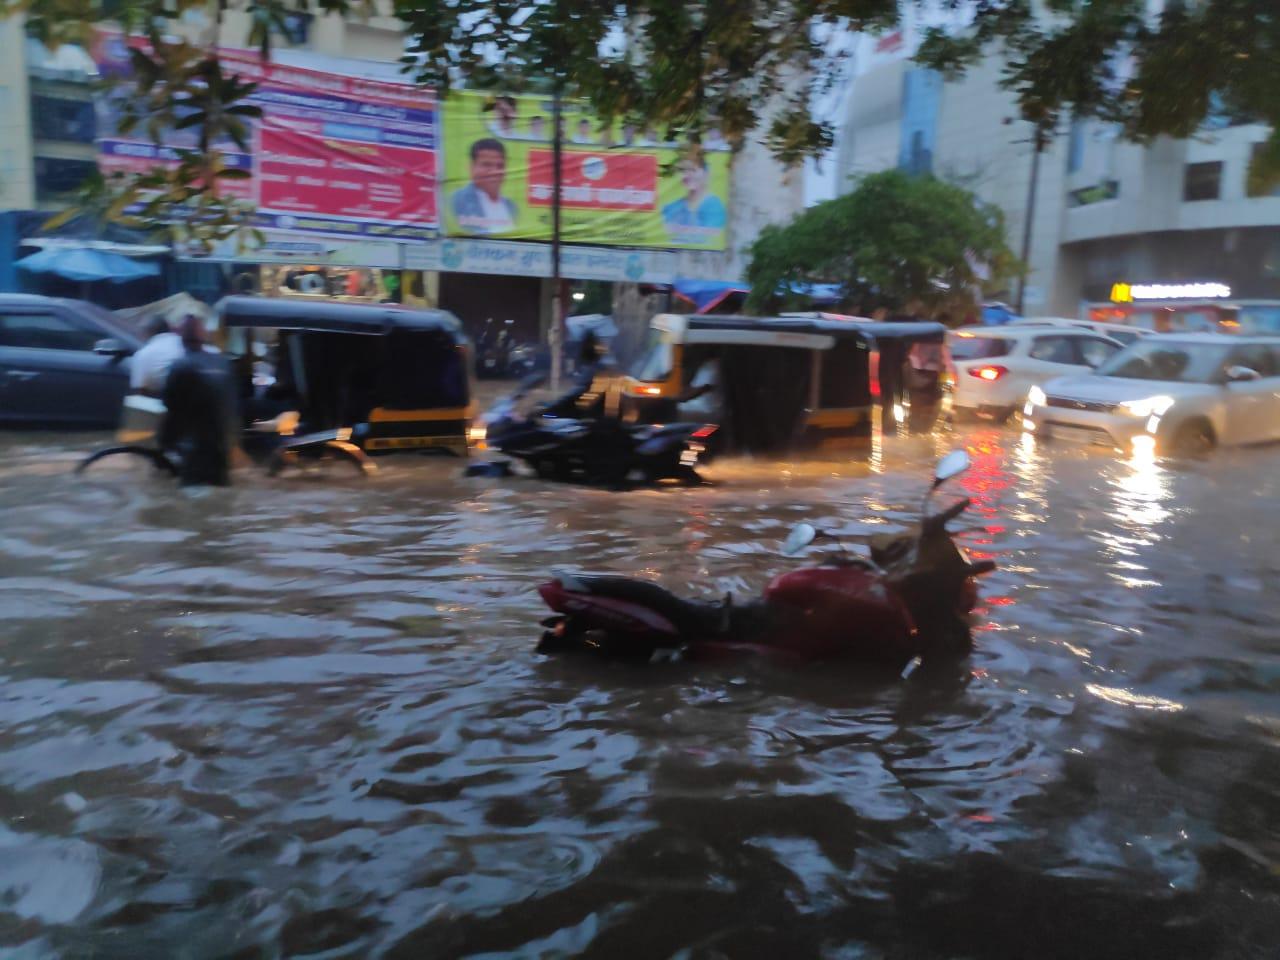 Maharashtra rains LIVE | Flood waters receding in Kolhapur, Sangli